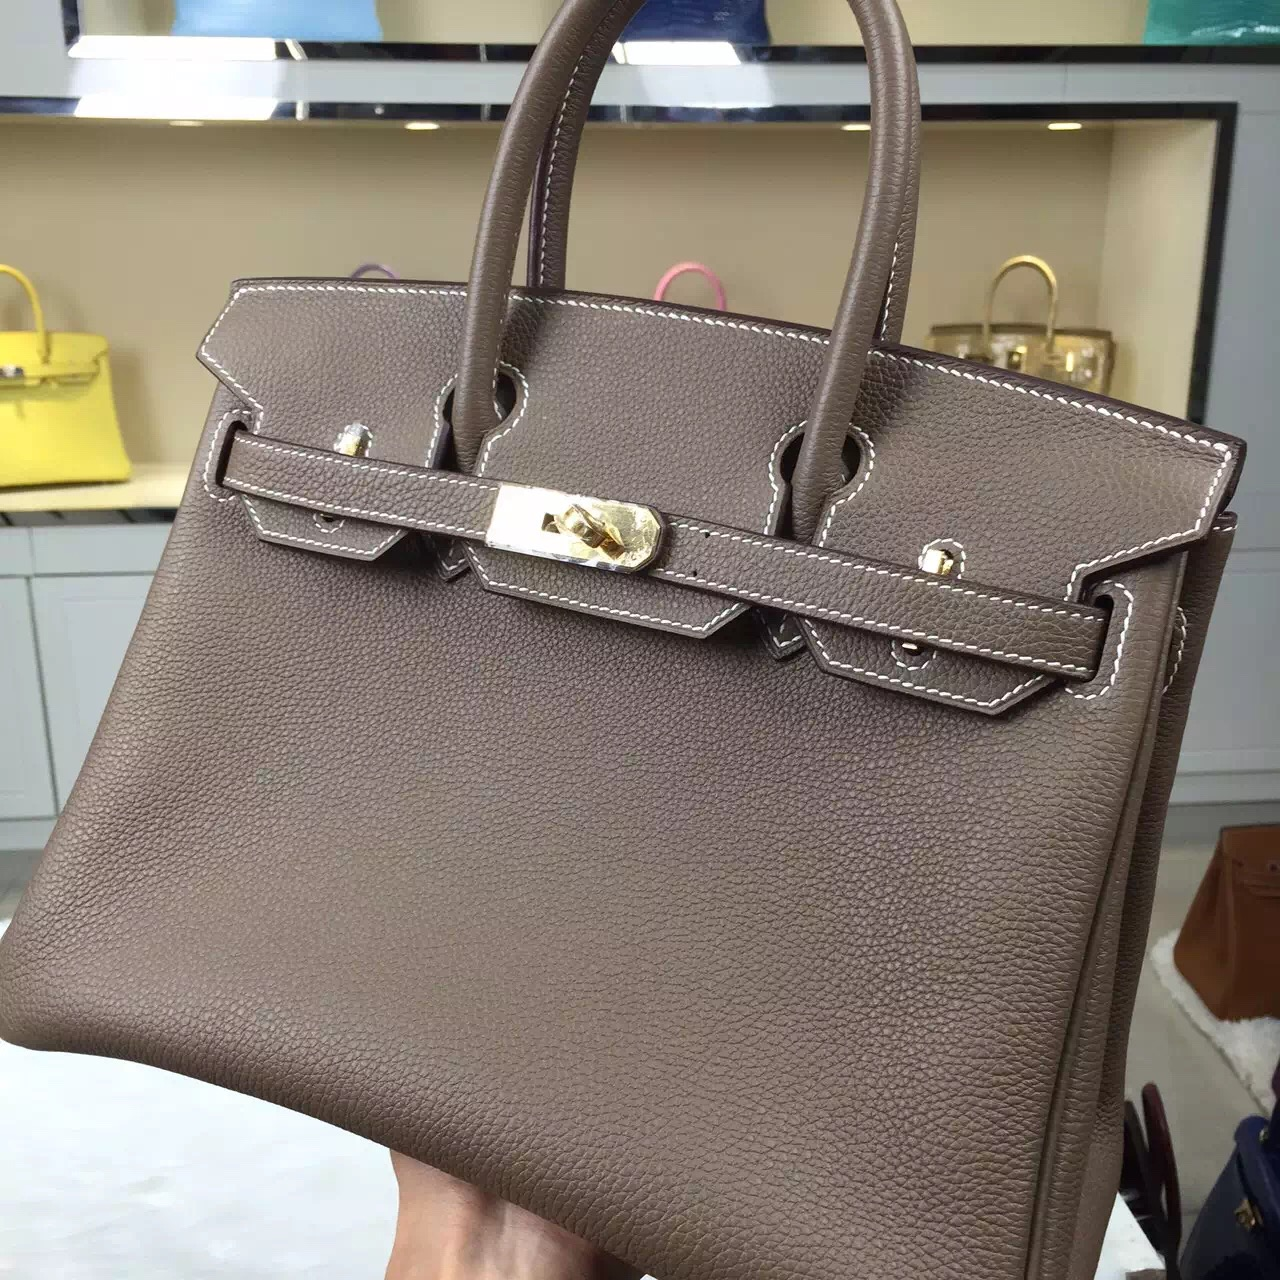 Luxury Ladies' Handbag Hermes CK18 Etoupe Grey Birkin Bag 30CM Togo Leather